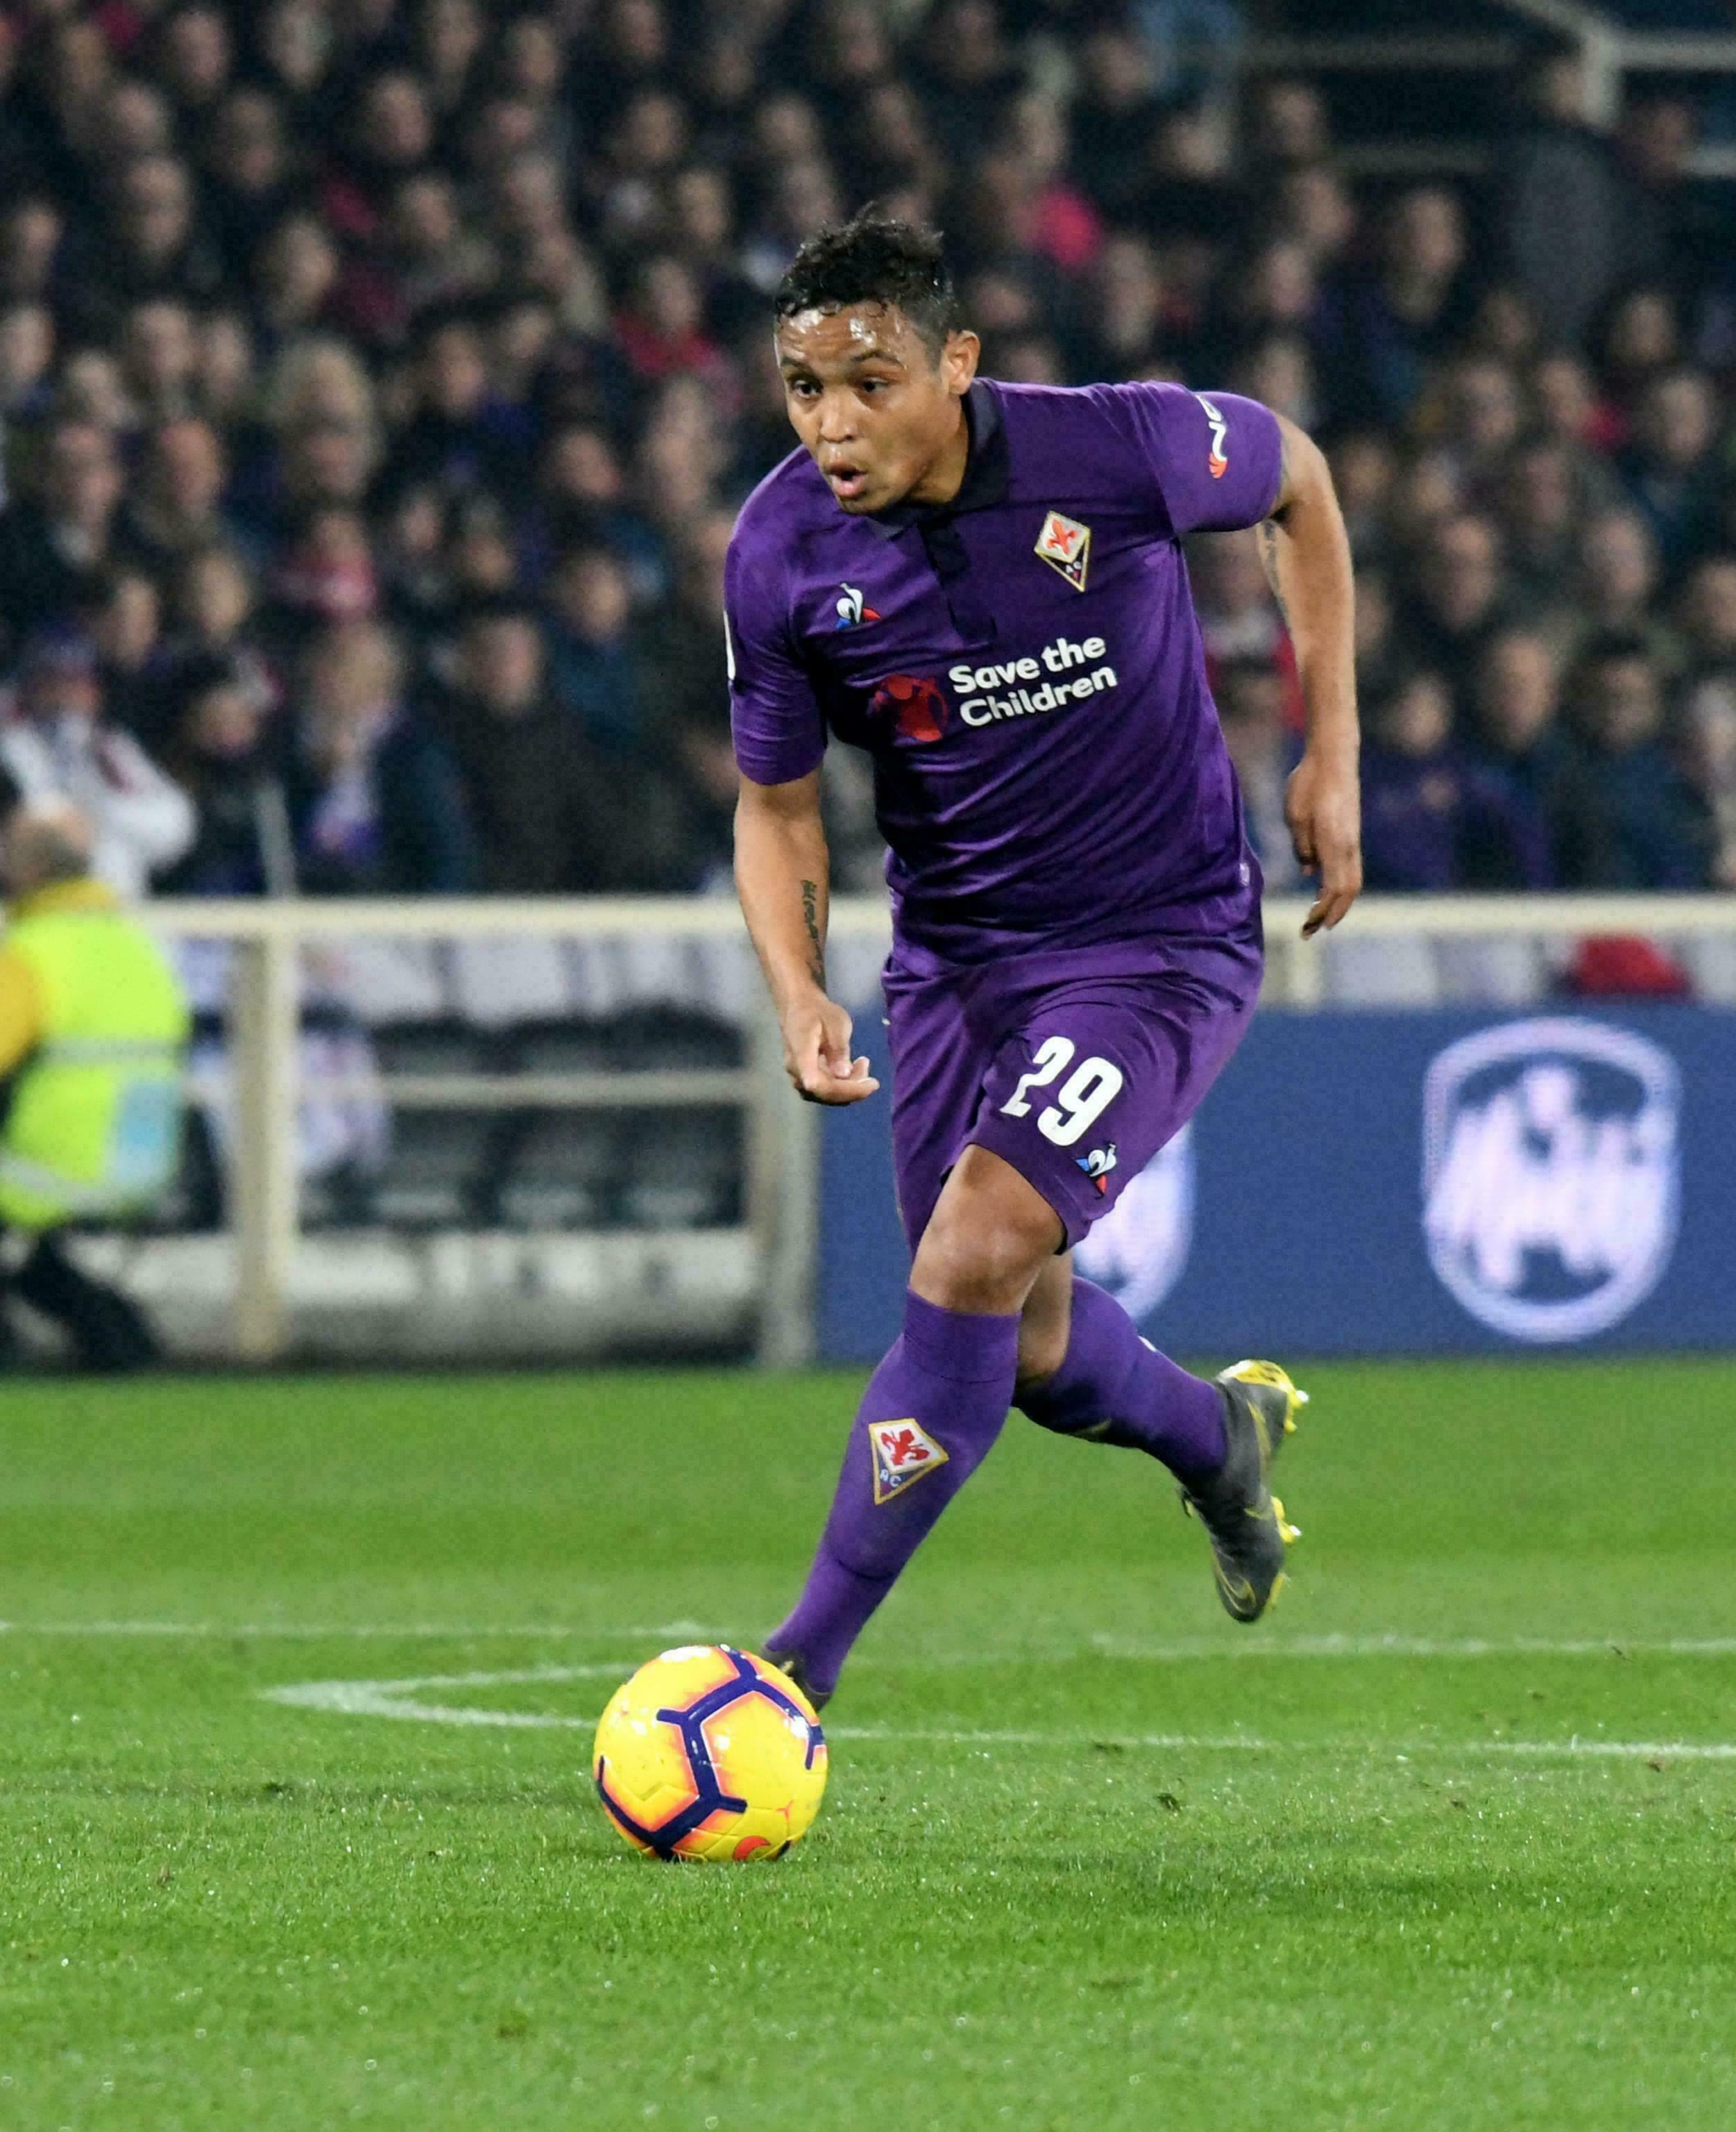 Fiorentina empata 3-3 en ida de semifinales de Copa Italia